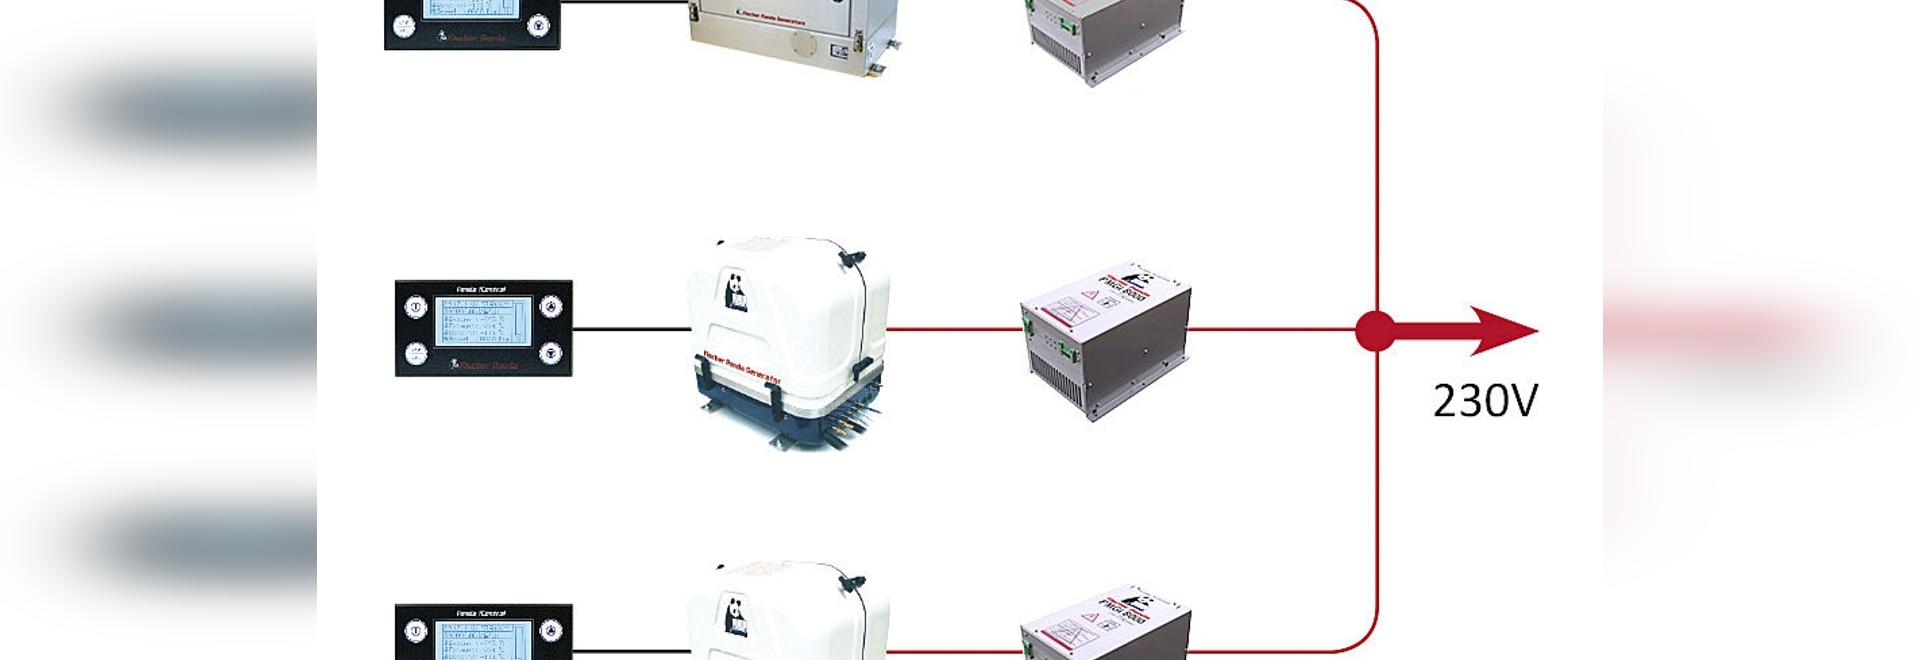 Unique Multiple Parallel Connection of Fischer Panda i-Series Generators